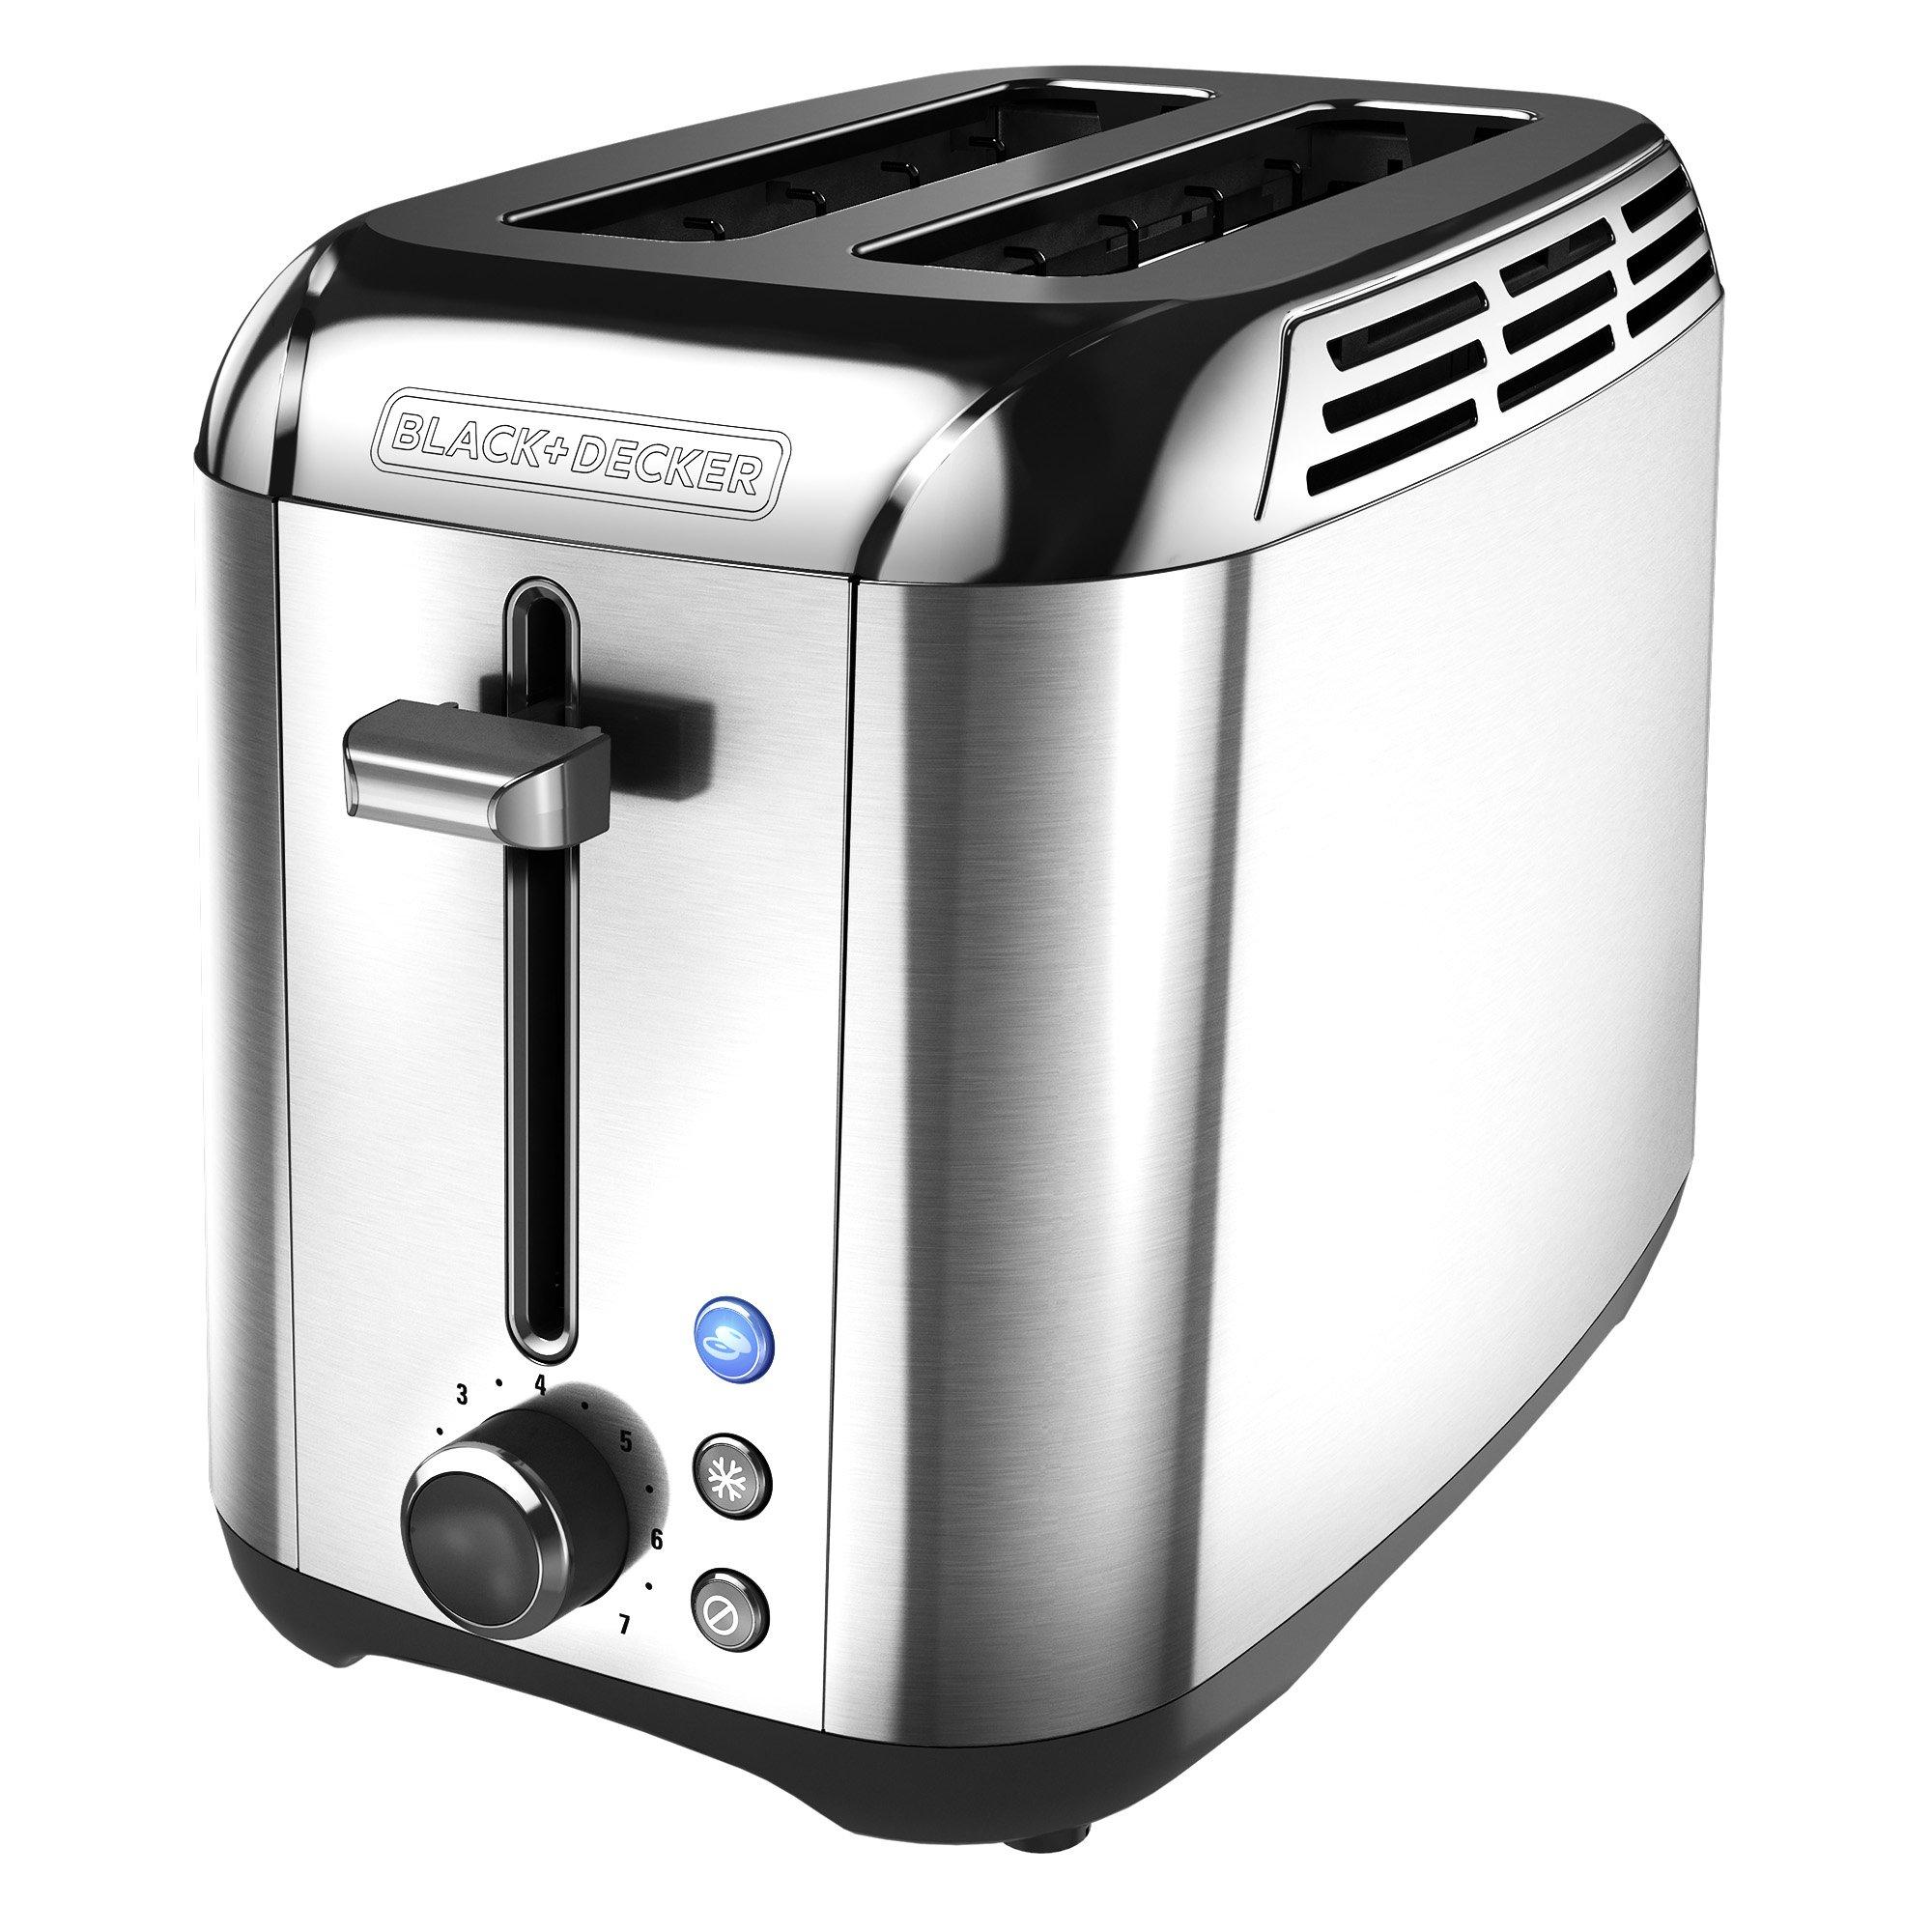 BLACK+DECKER 2-Slice Toaster, Rapid Toast, Stainless Steel, TR3500SD by BLACK+DECKER